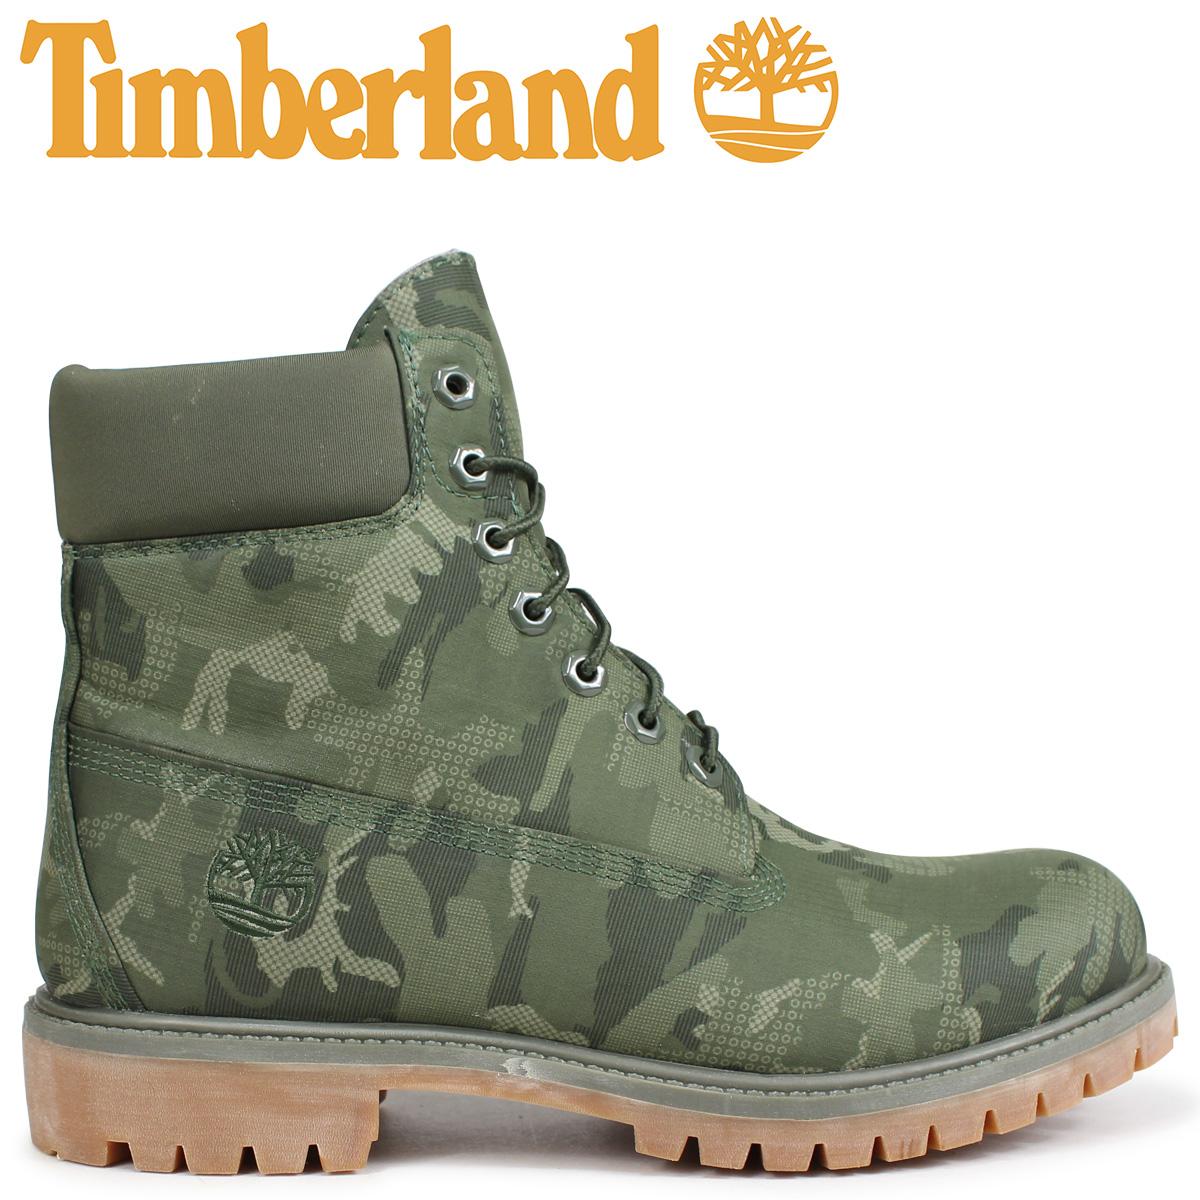 Timberland ブーツ メンズ 6インチ ティンバーランド 6-INCH PREMIUM FABRIC BOOTS A1U9I Wワイズ ダークグリーン [9/5 新入荷]